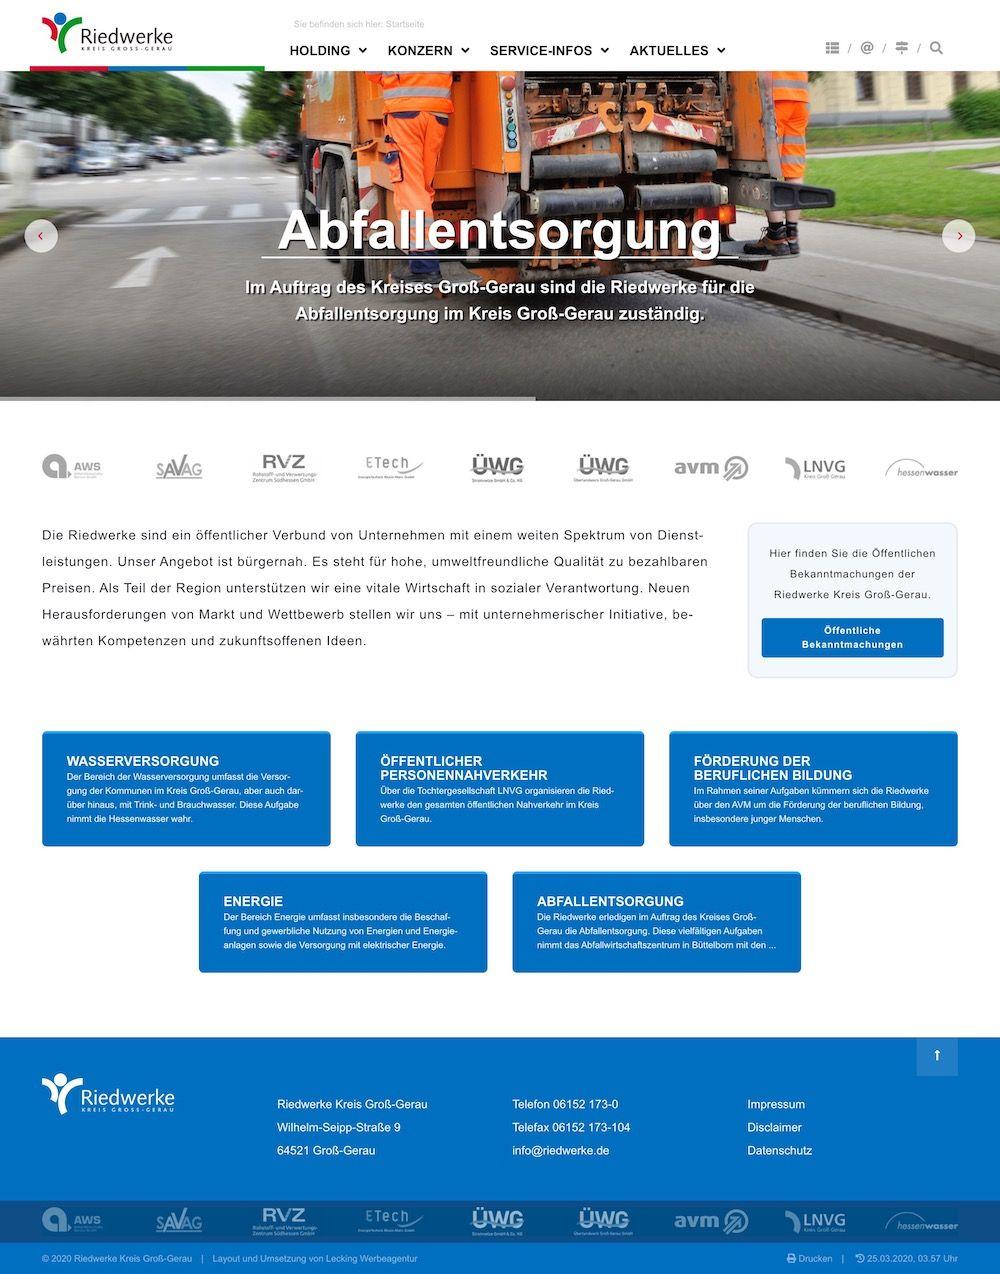 Screenshot der Seite: www.riedwerke.de